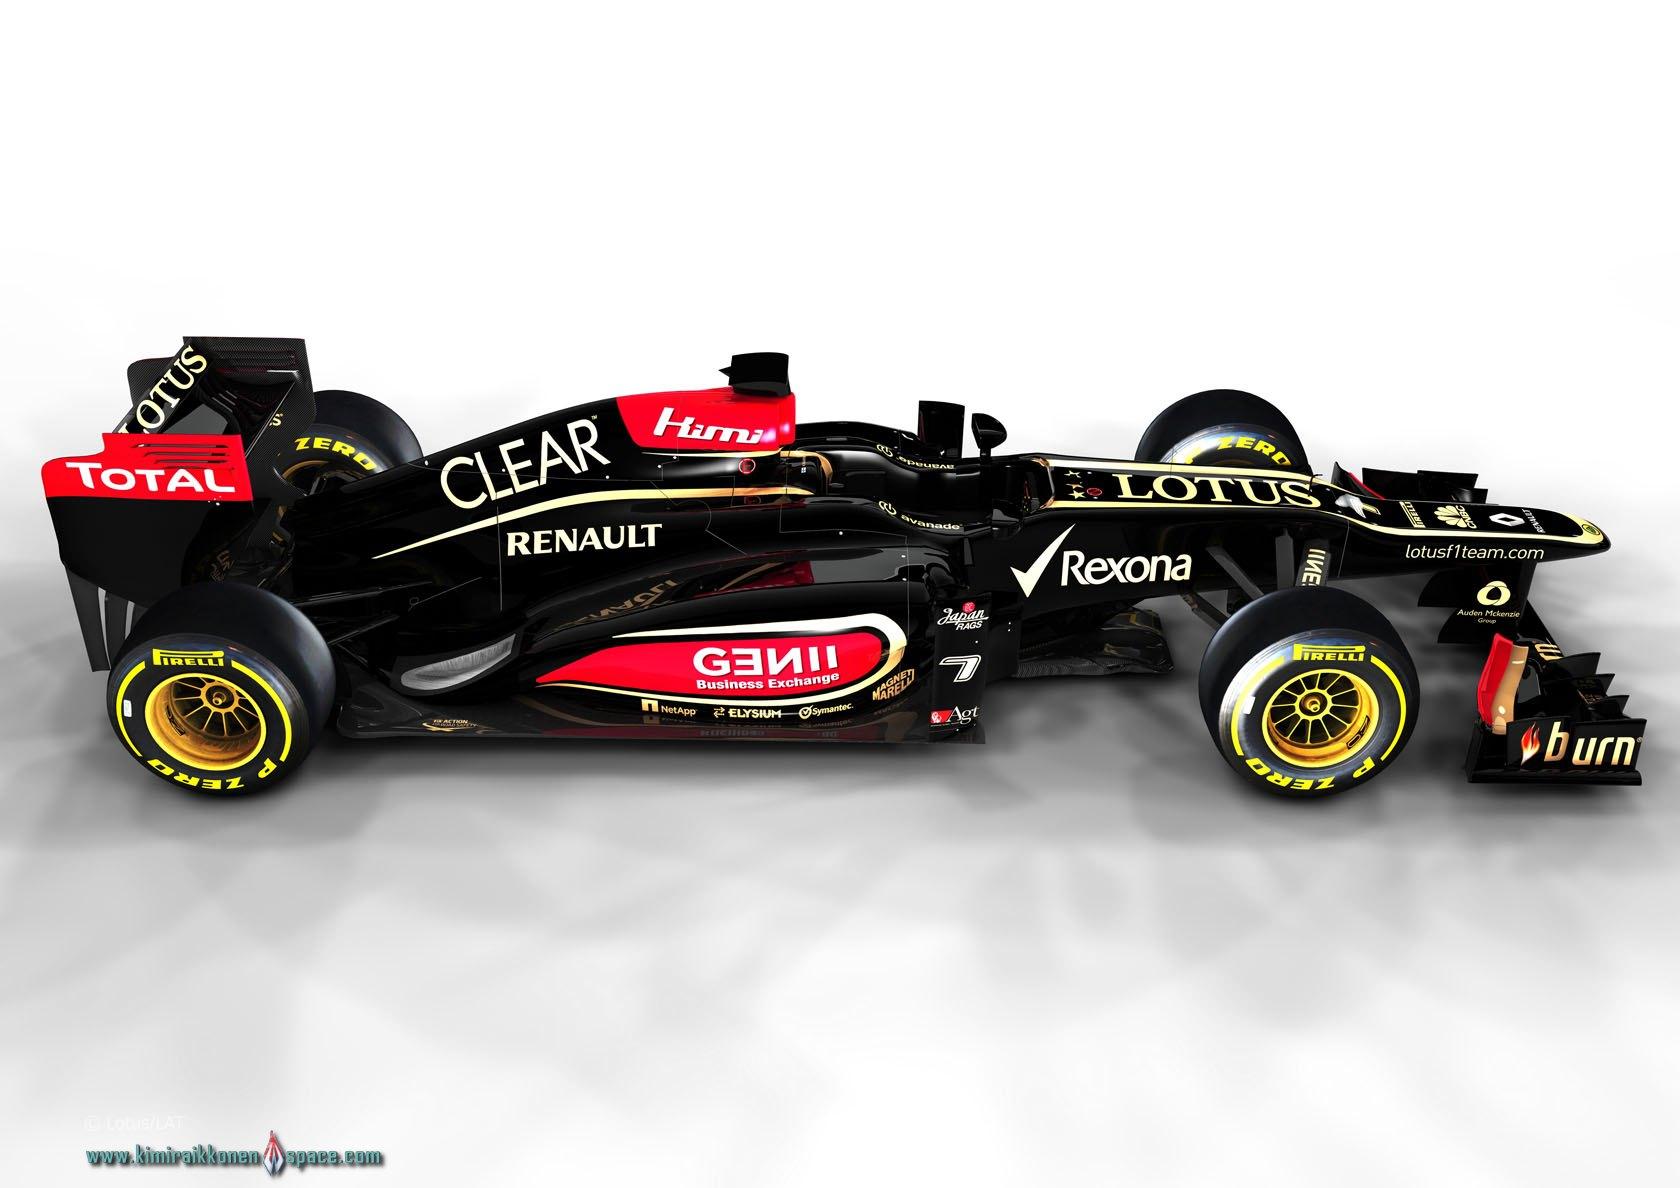 Lotus F1 Team 2013 Launch Photoshoot Krs